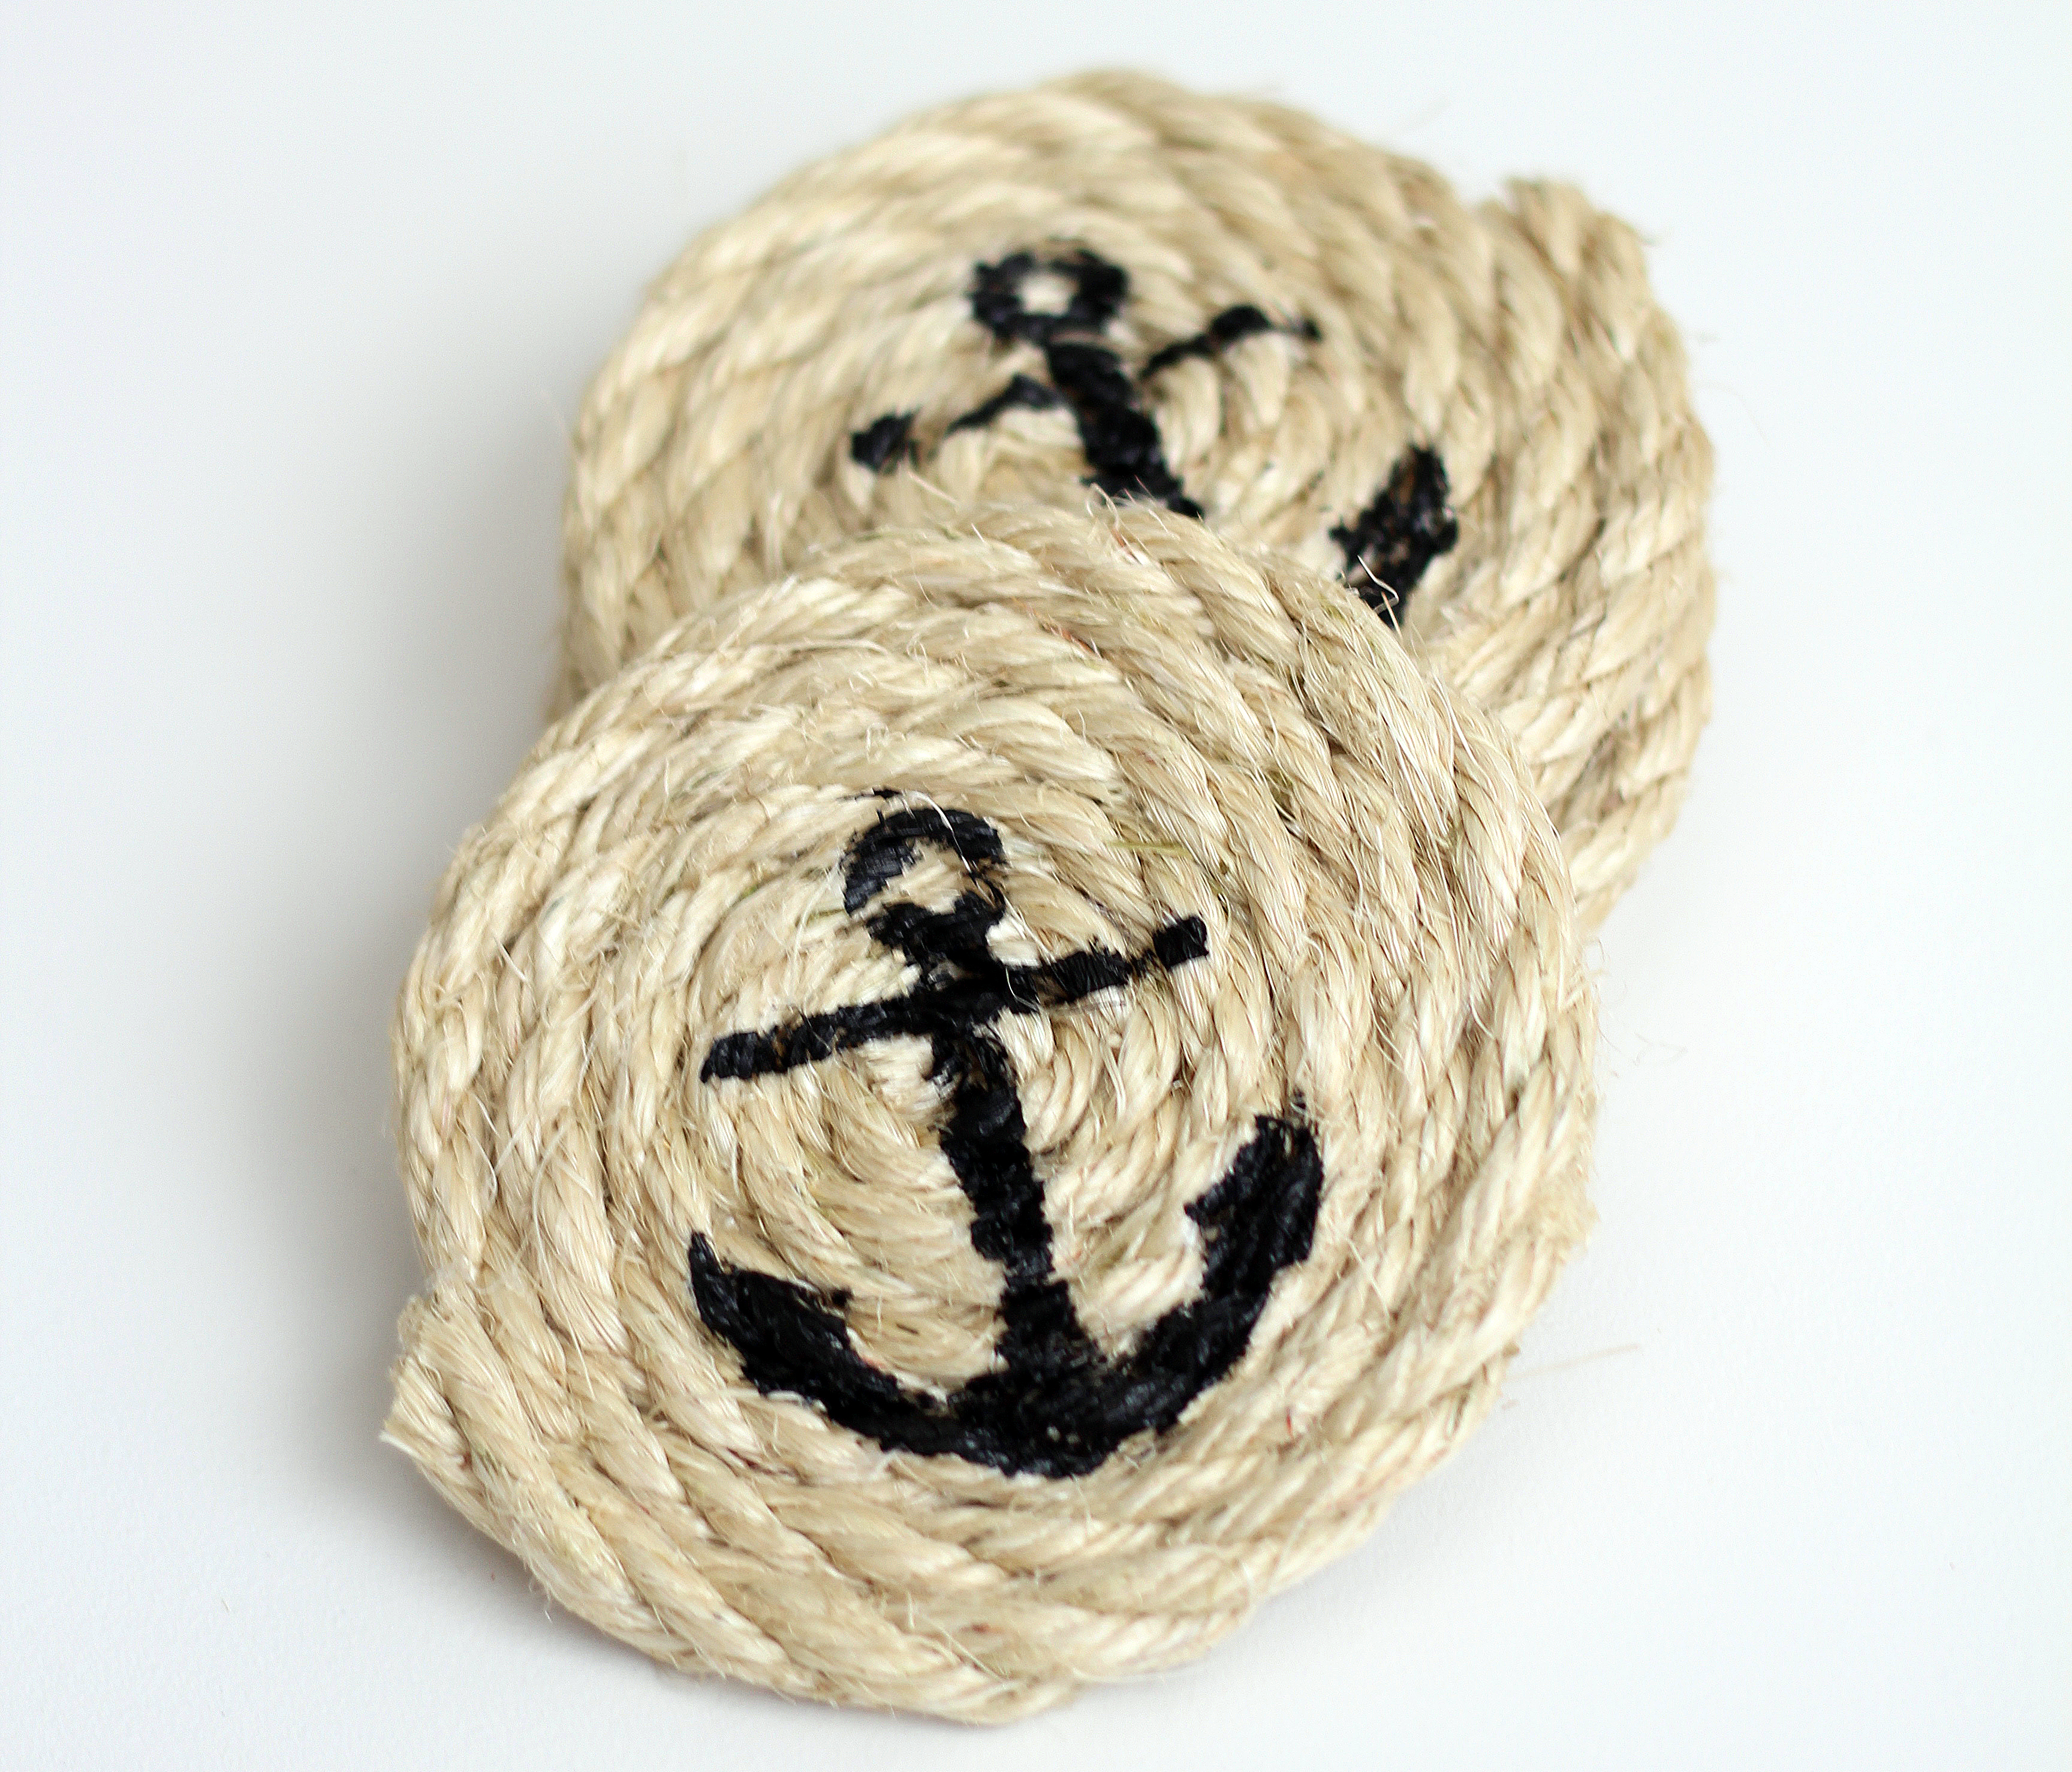 Nautical Sisal Rope Coasters